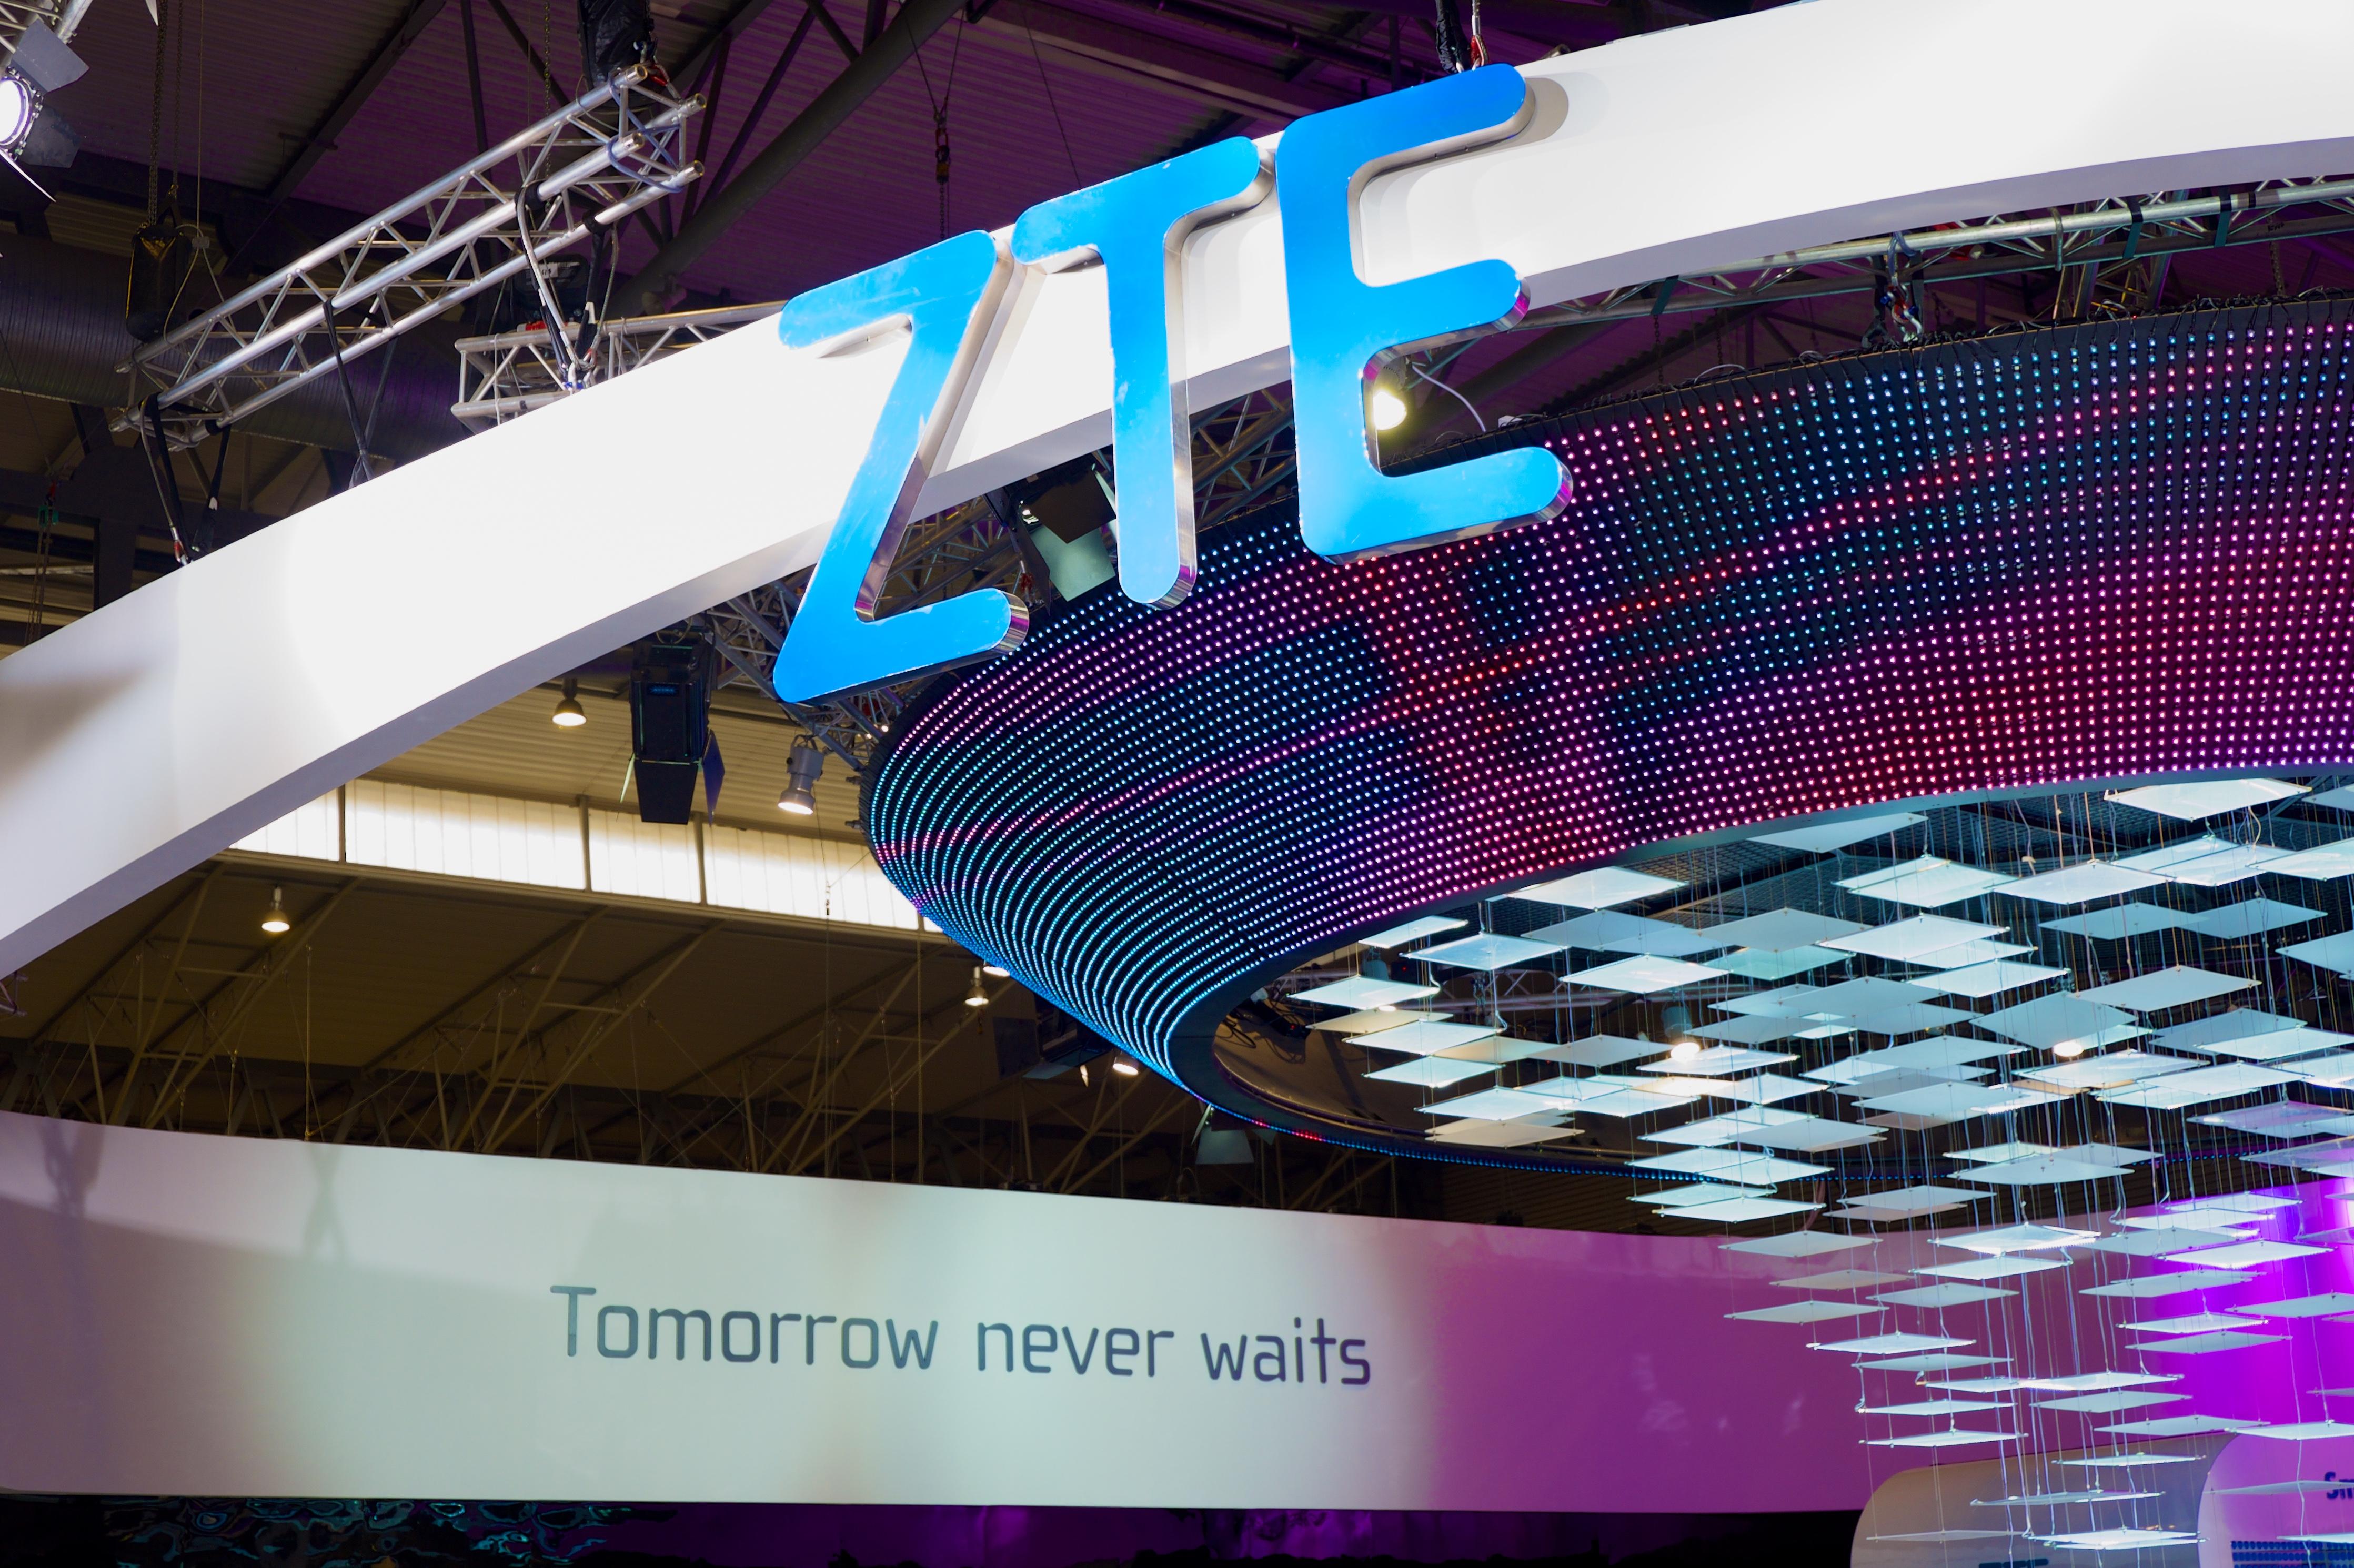 「zte」的圖片搜尋結果